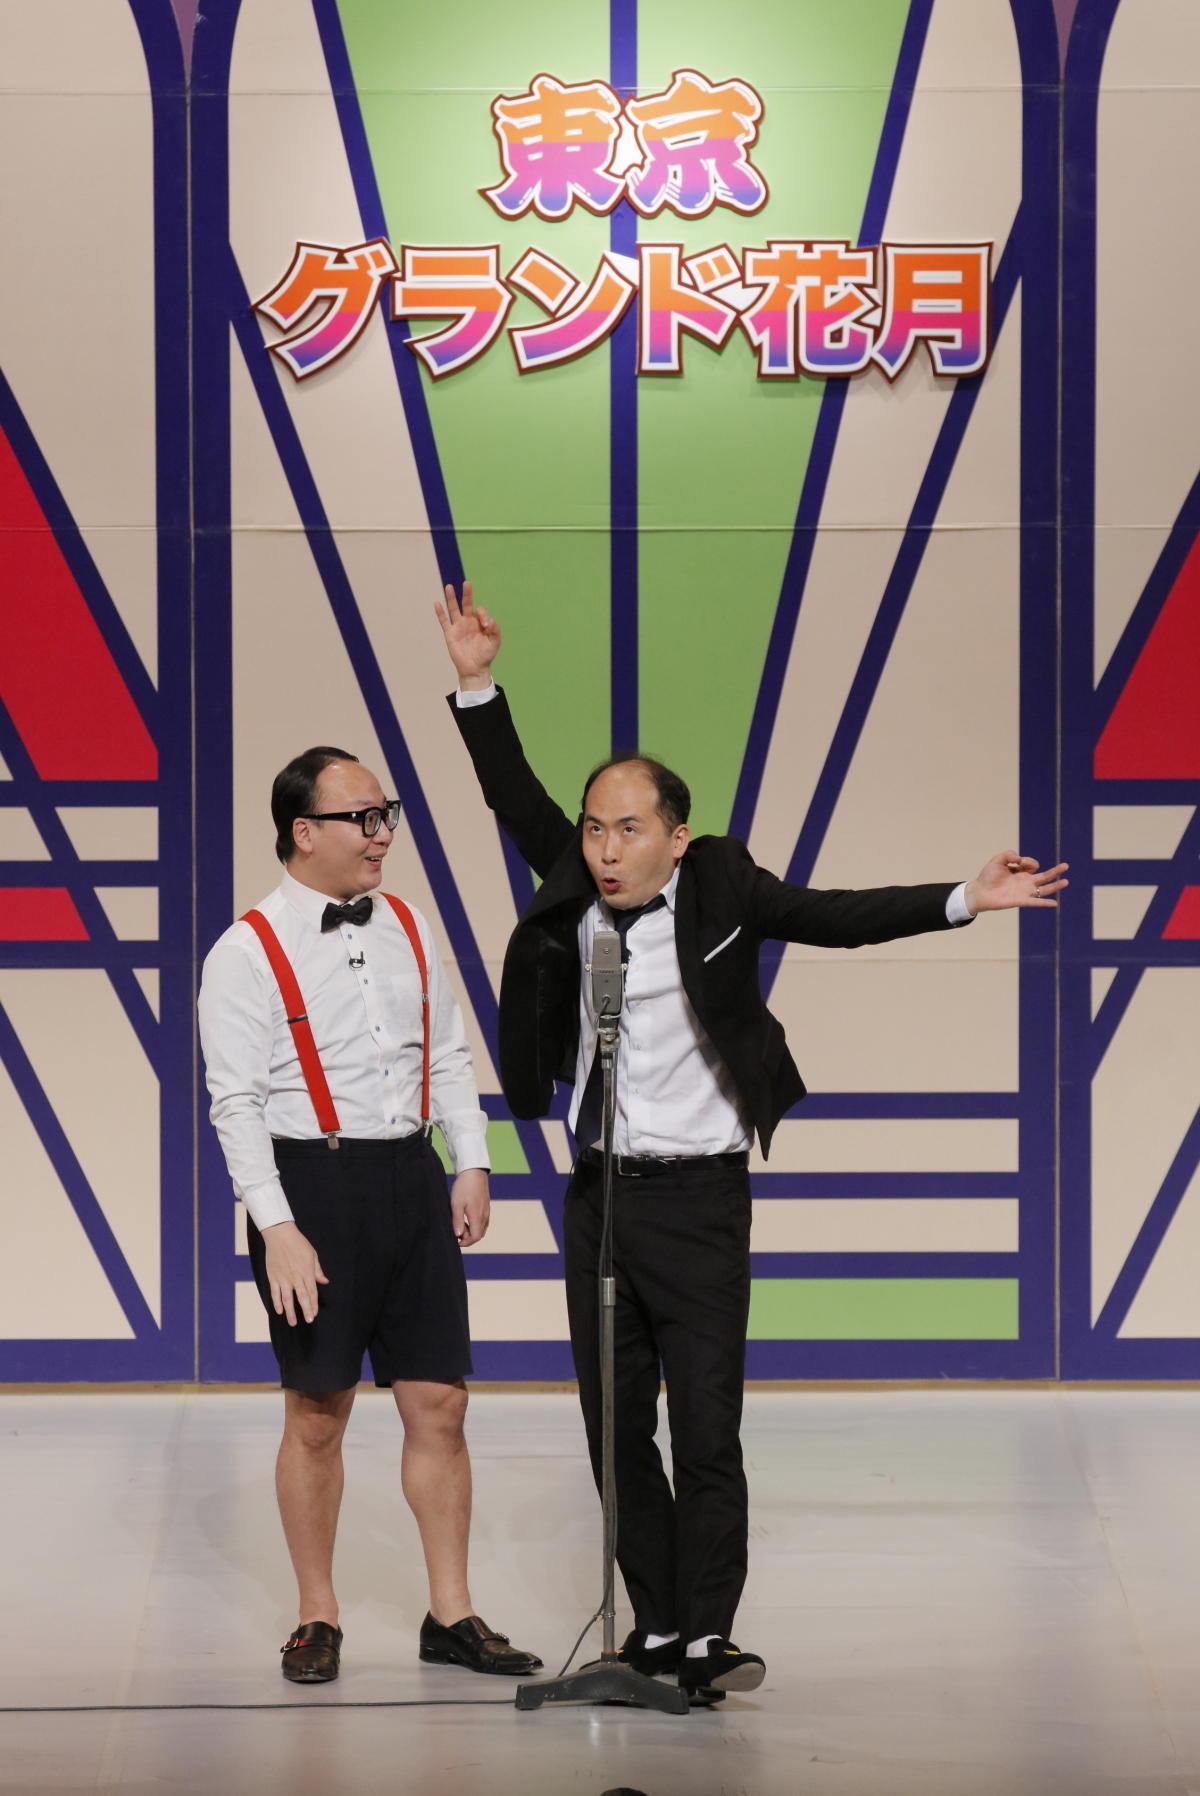 http://news.yoshimoto.co.jp/20180311220000-8546d68361af2f6f8502b4c4bcd9704876423e82.jpg